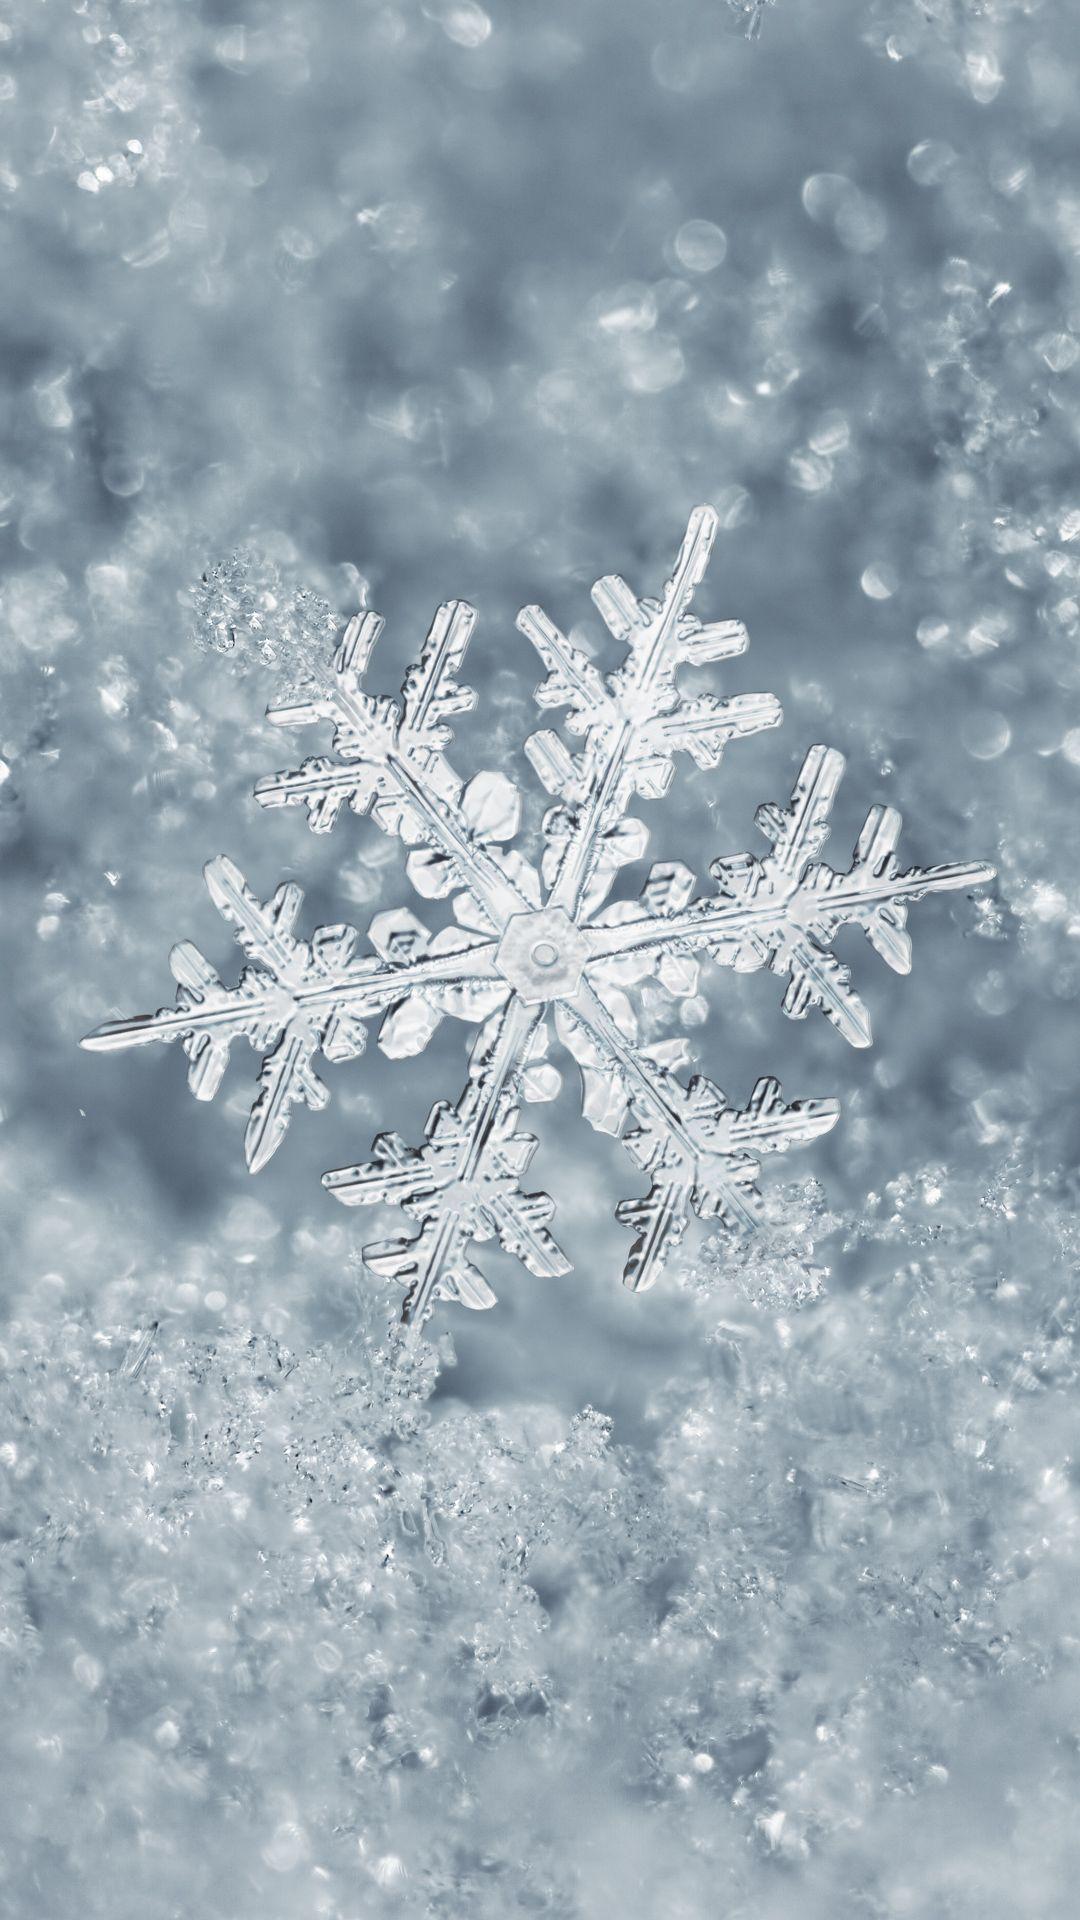 Ice Snowflake iPhone 7 Plus Wallpaper | Winter Wallpaper ...